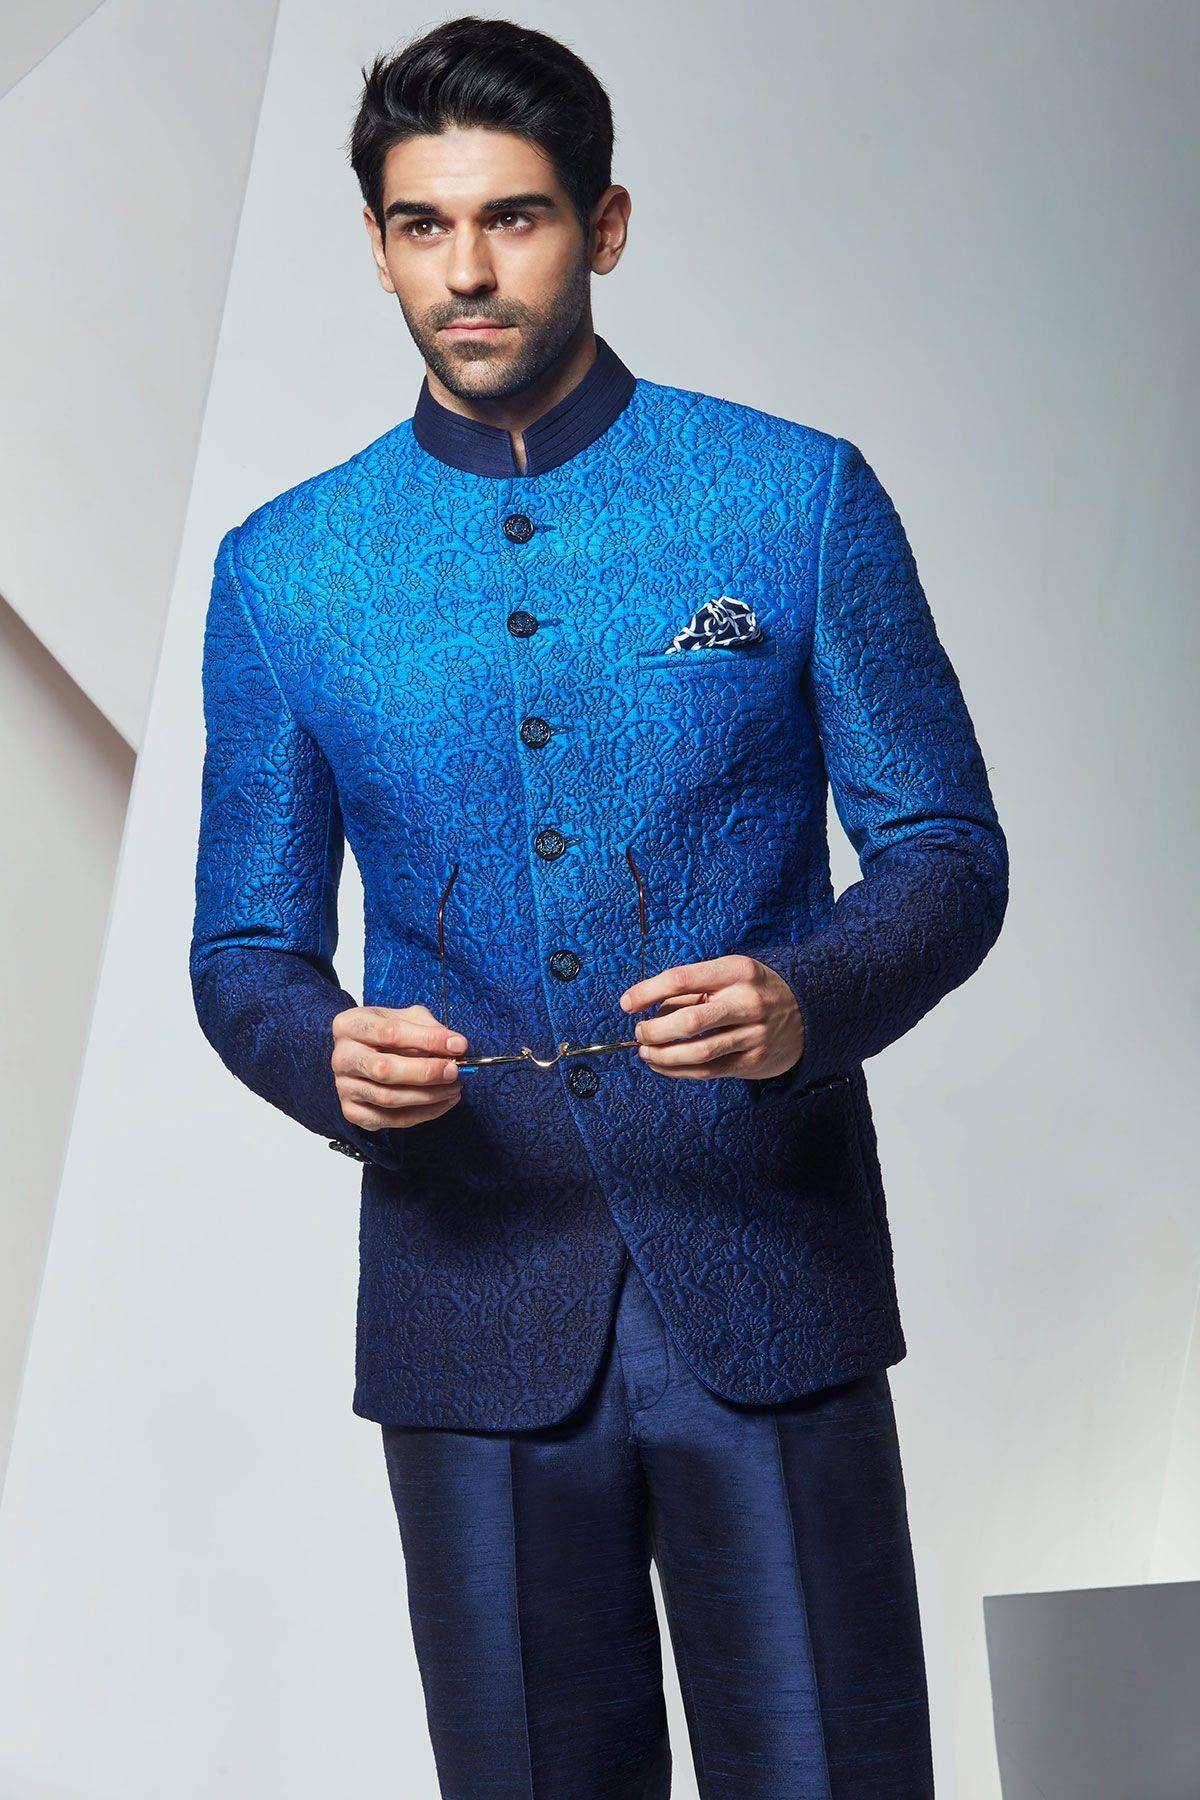 Designer Jodhpuri Suit Jodhpuri Suit For Wedding Mens Wedding Suit